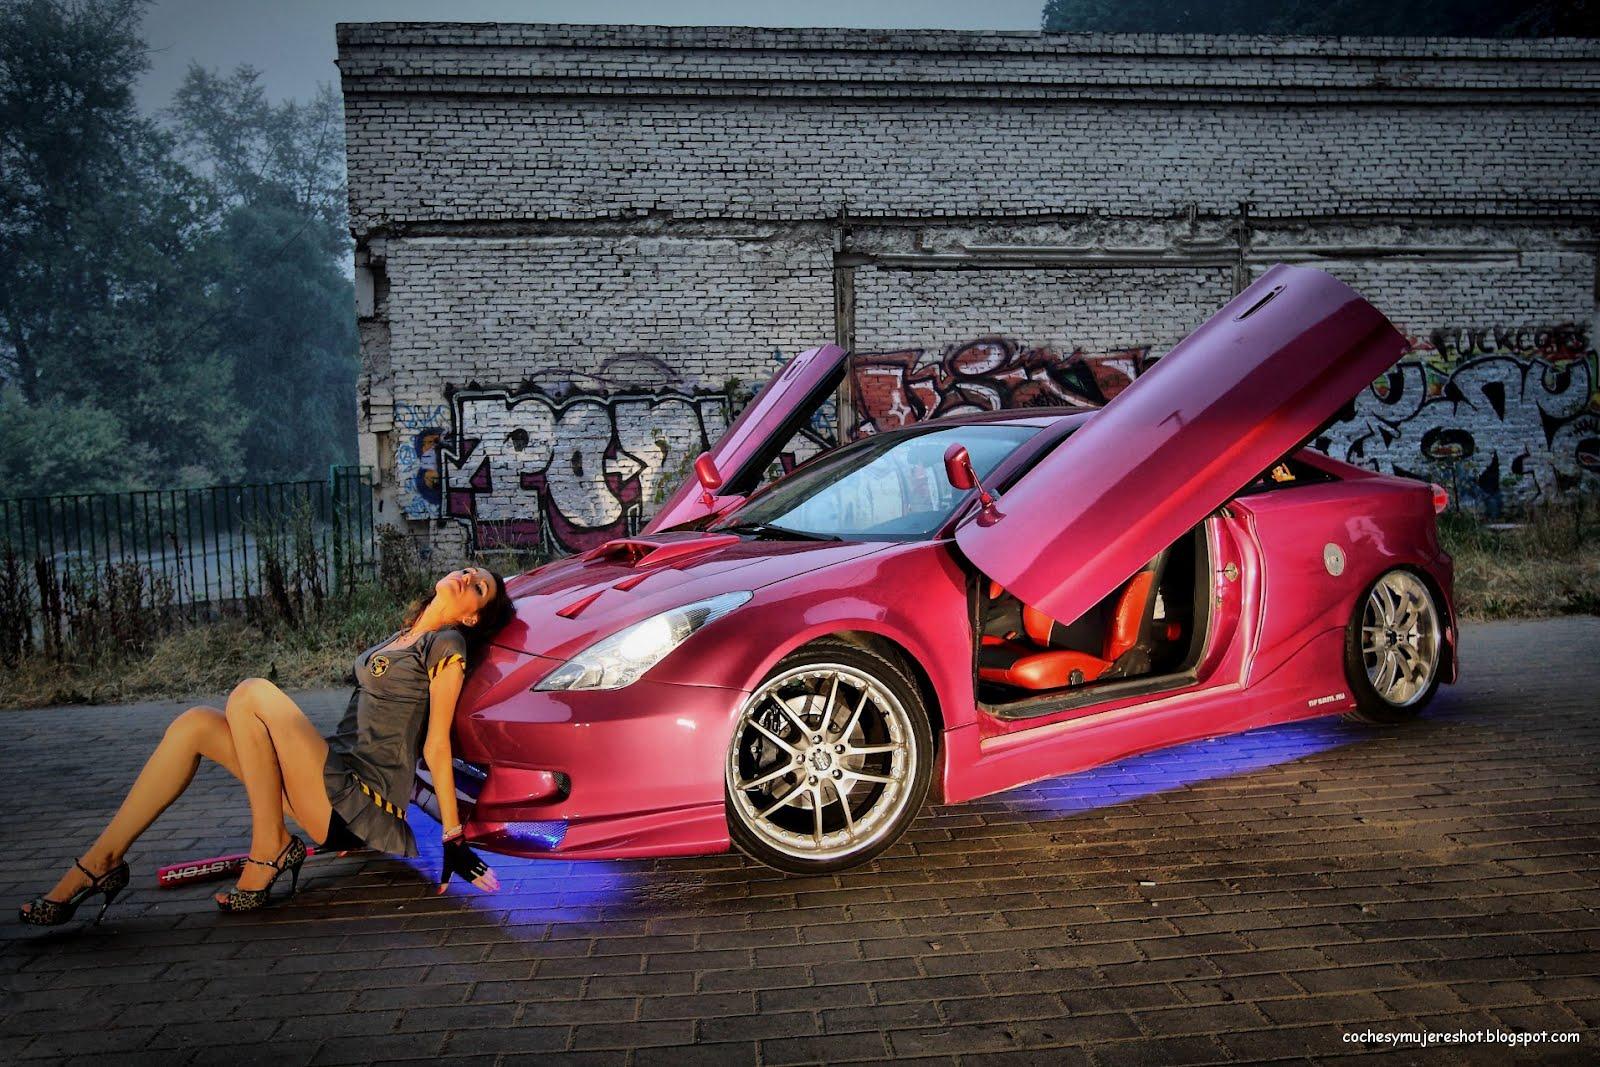 http://3.bp.blogspot.com/-8xzs3z0BU7c/T4GdVeoKTYI/AAAAAAAAAxQ/svw3_jWWg4s/s1600/coches-mujeres-tuning-car-walllpapers-fondo-pantalla-nfs-diosa-custom-guapa.jpg